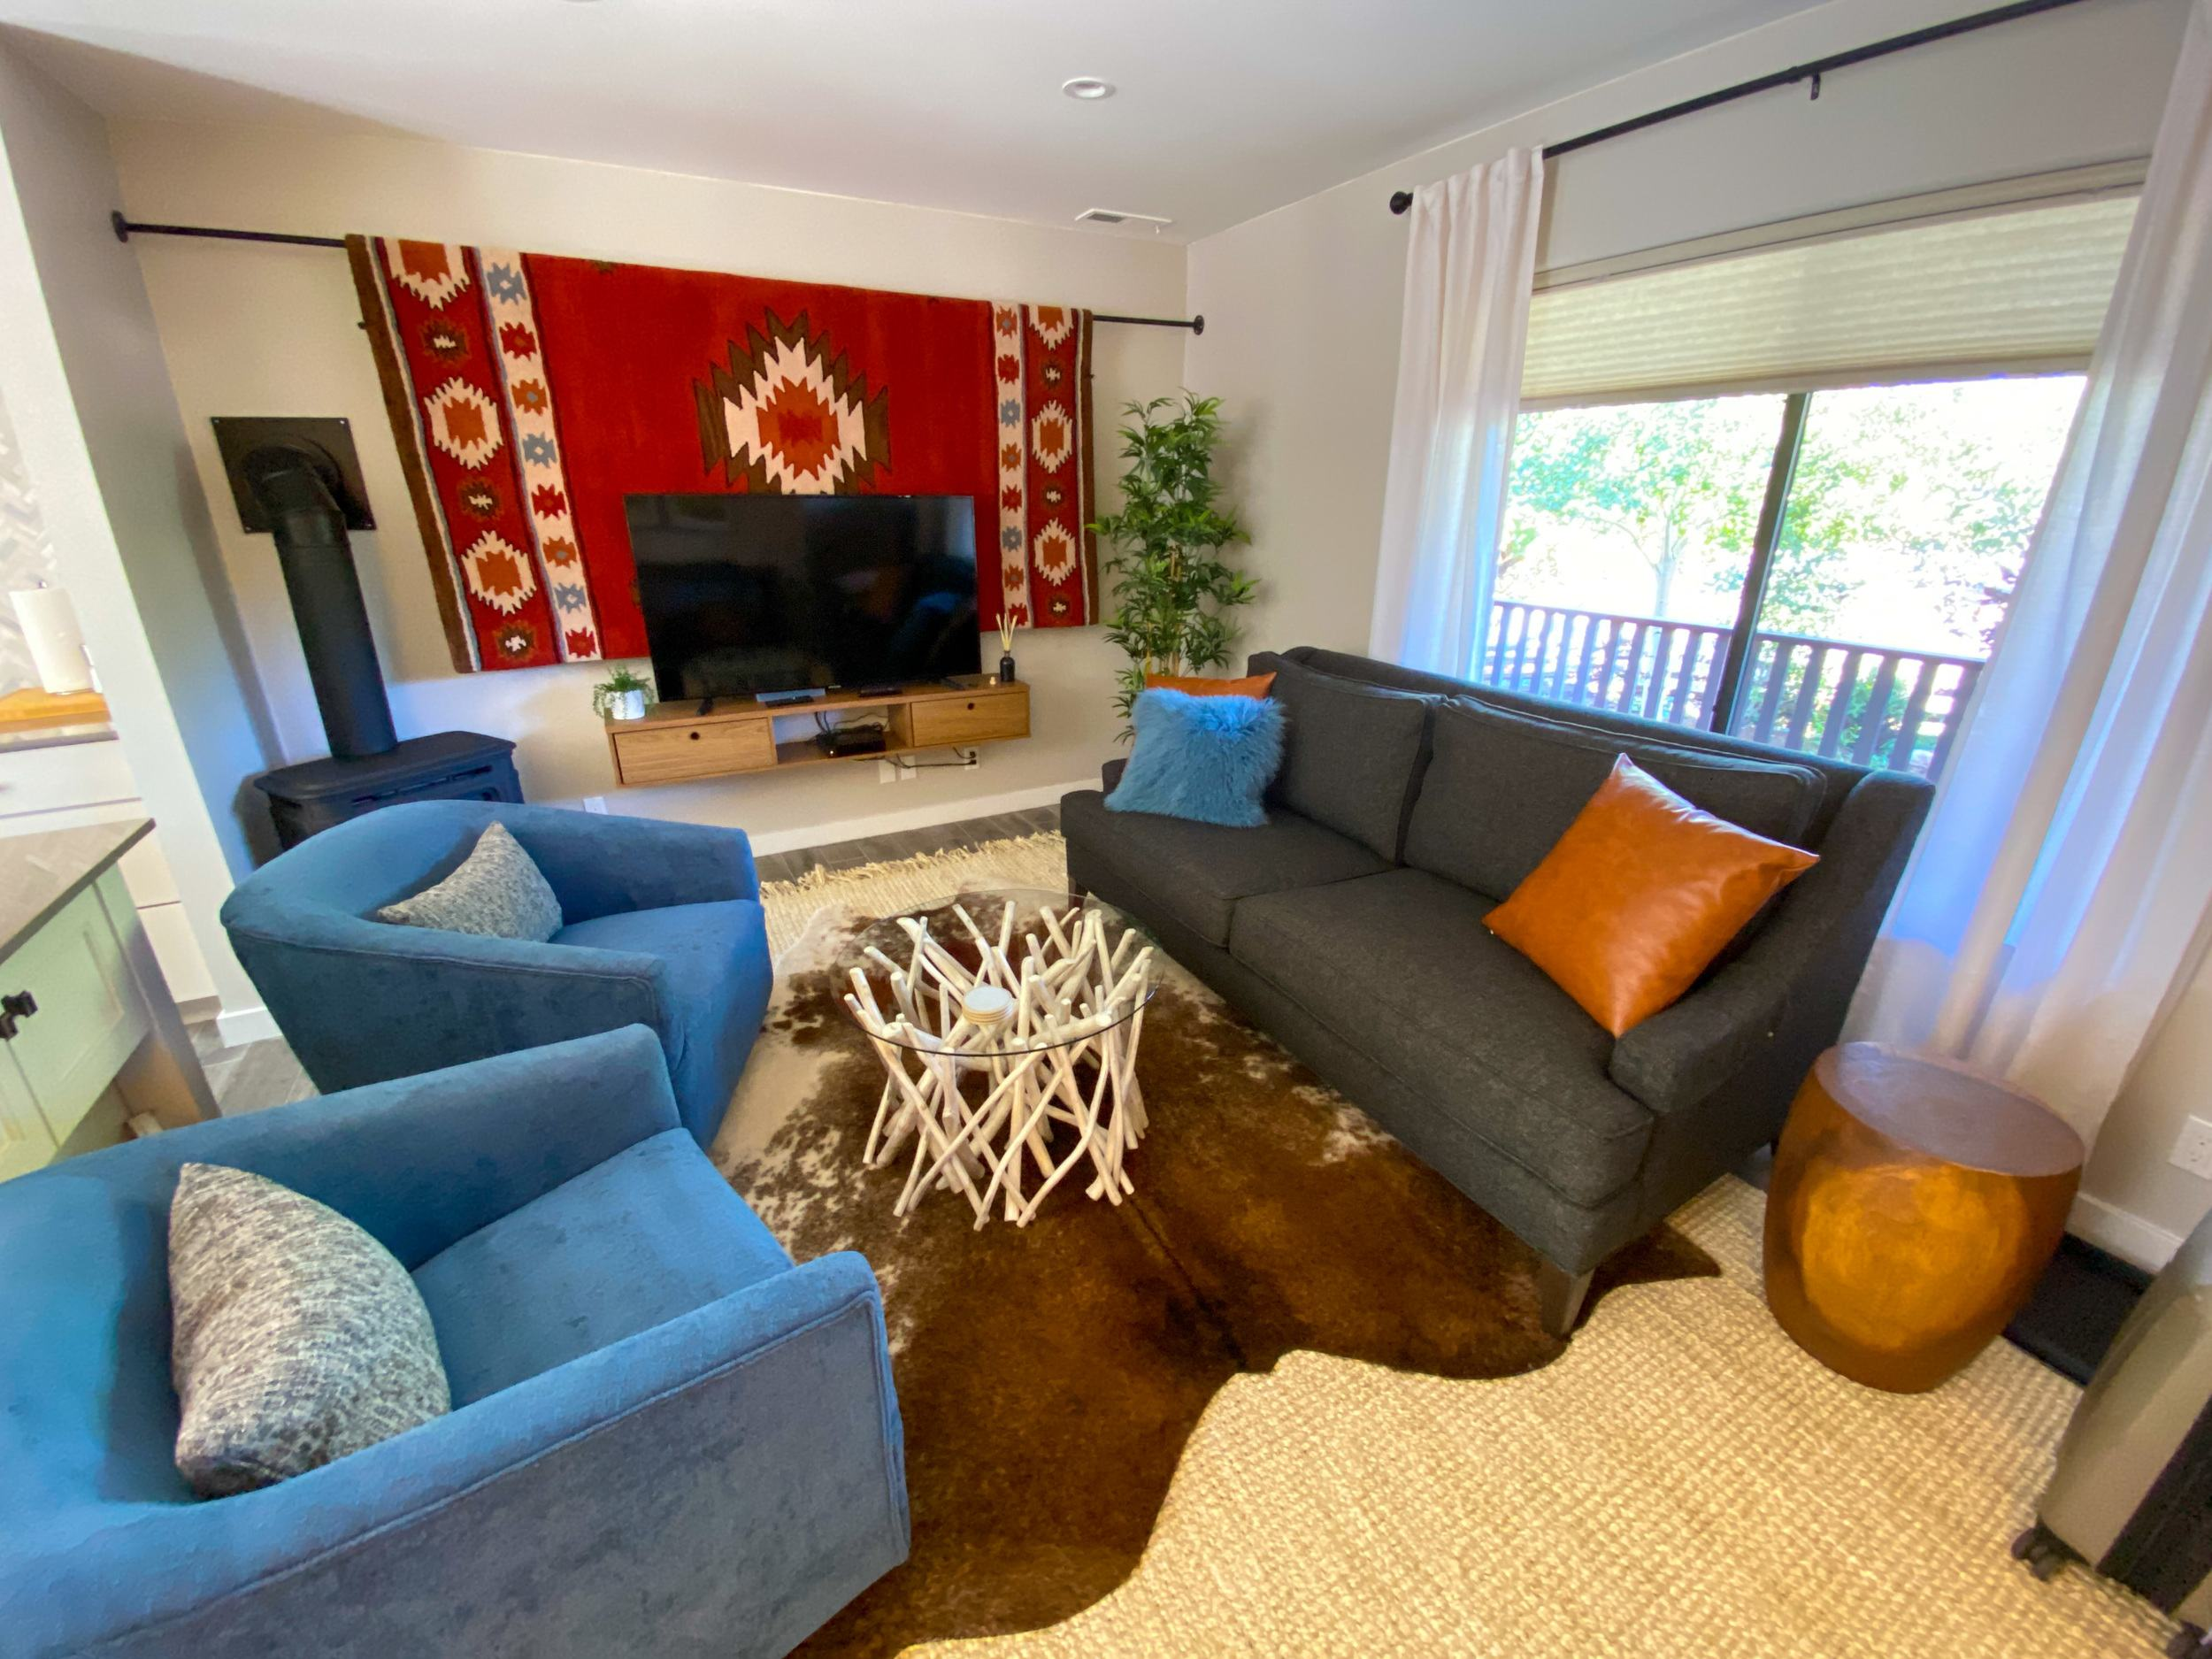 3-bedroom Flagstaff AirBnB